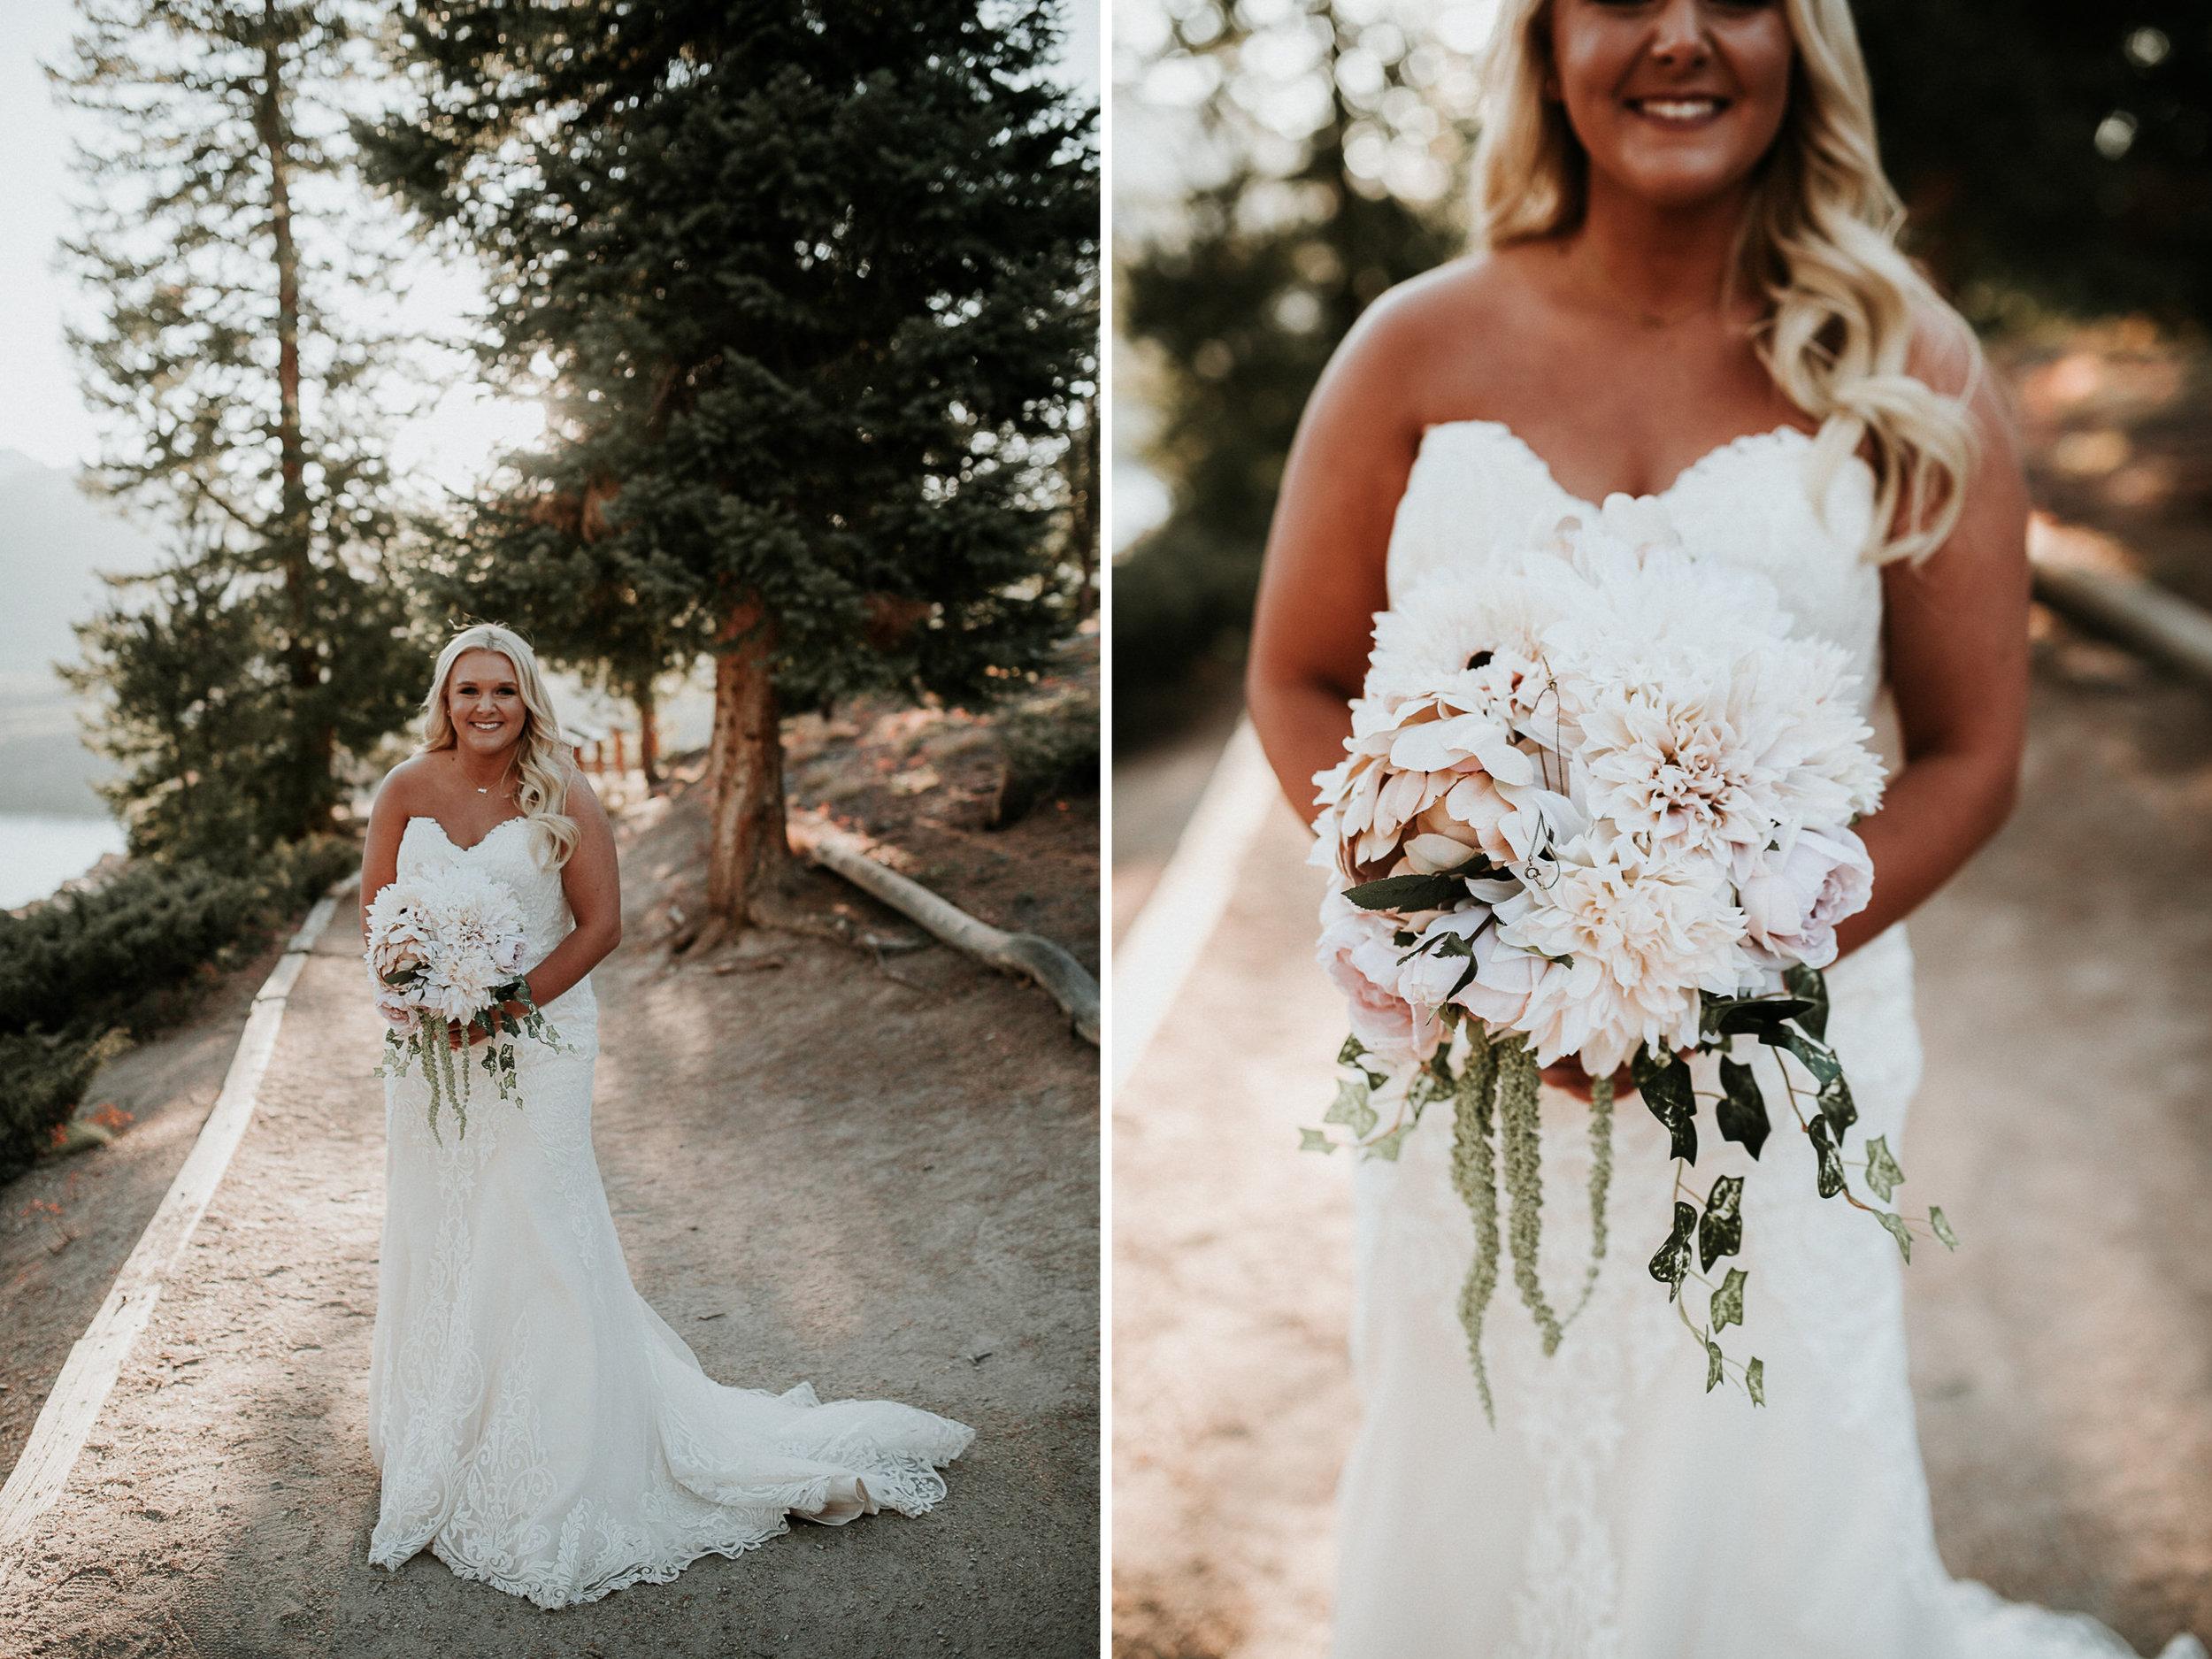 st. louis wedding photographer Zach&Rosalie - Lake Dillon CO Elopement 11.jpg